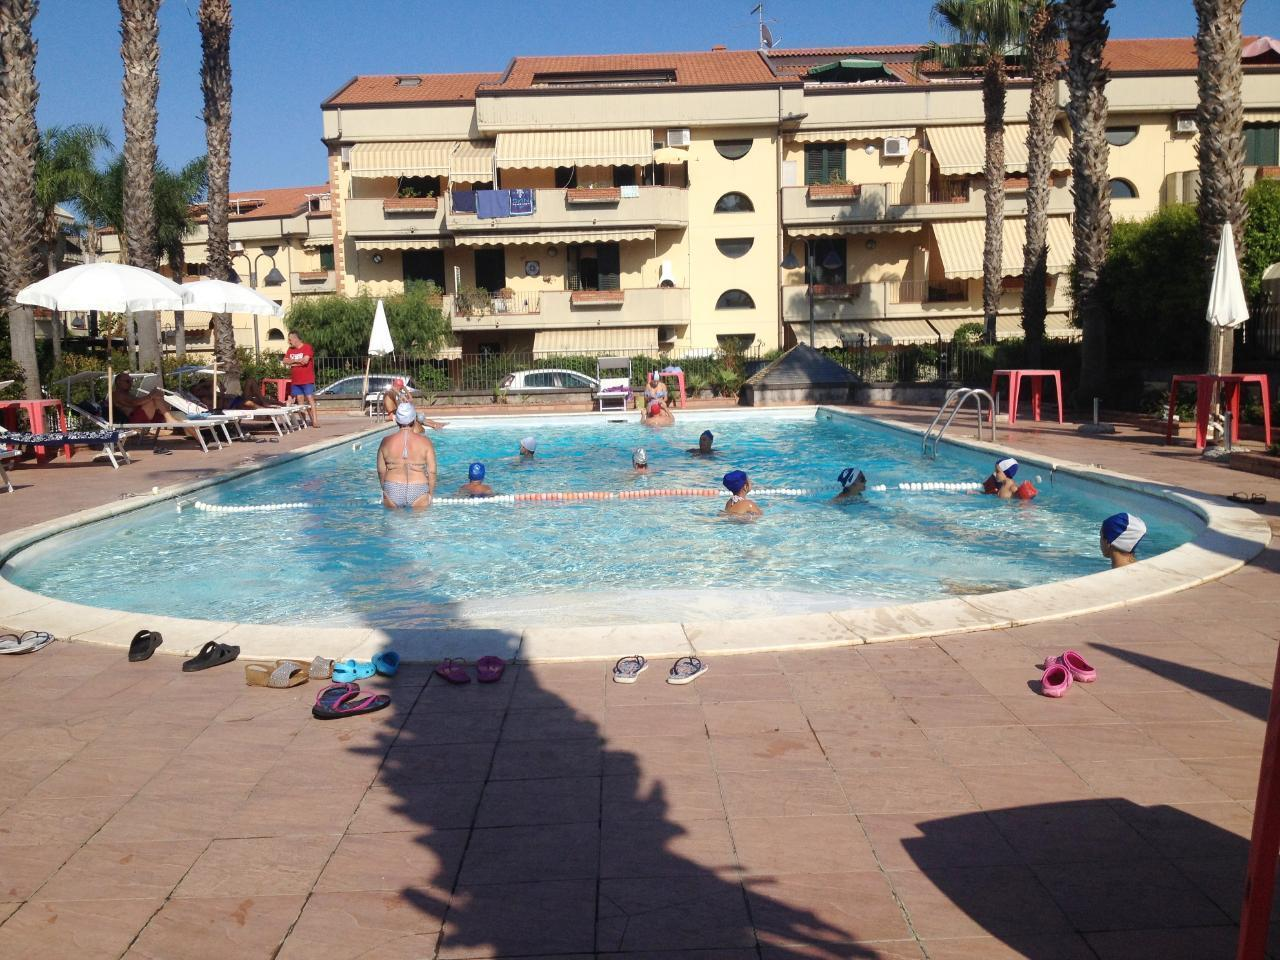 Appartement de vacances MARE - ETNA - TAORMINA (2618228), Mascali, Catania, Sicile, Italie, image 2